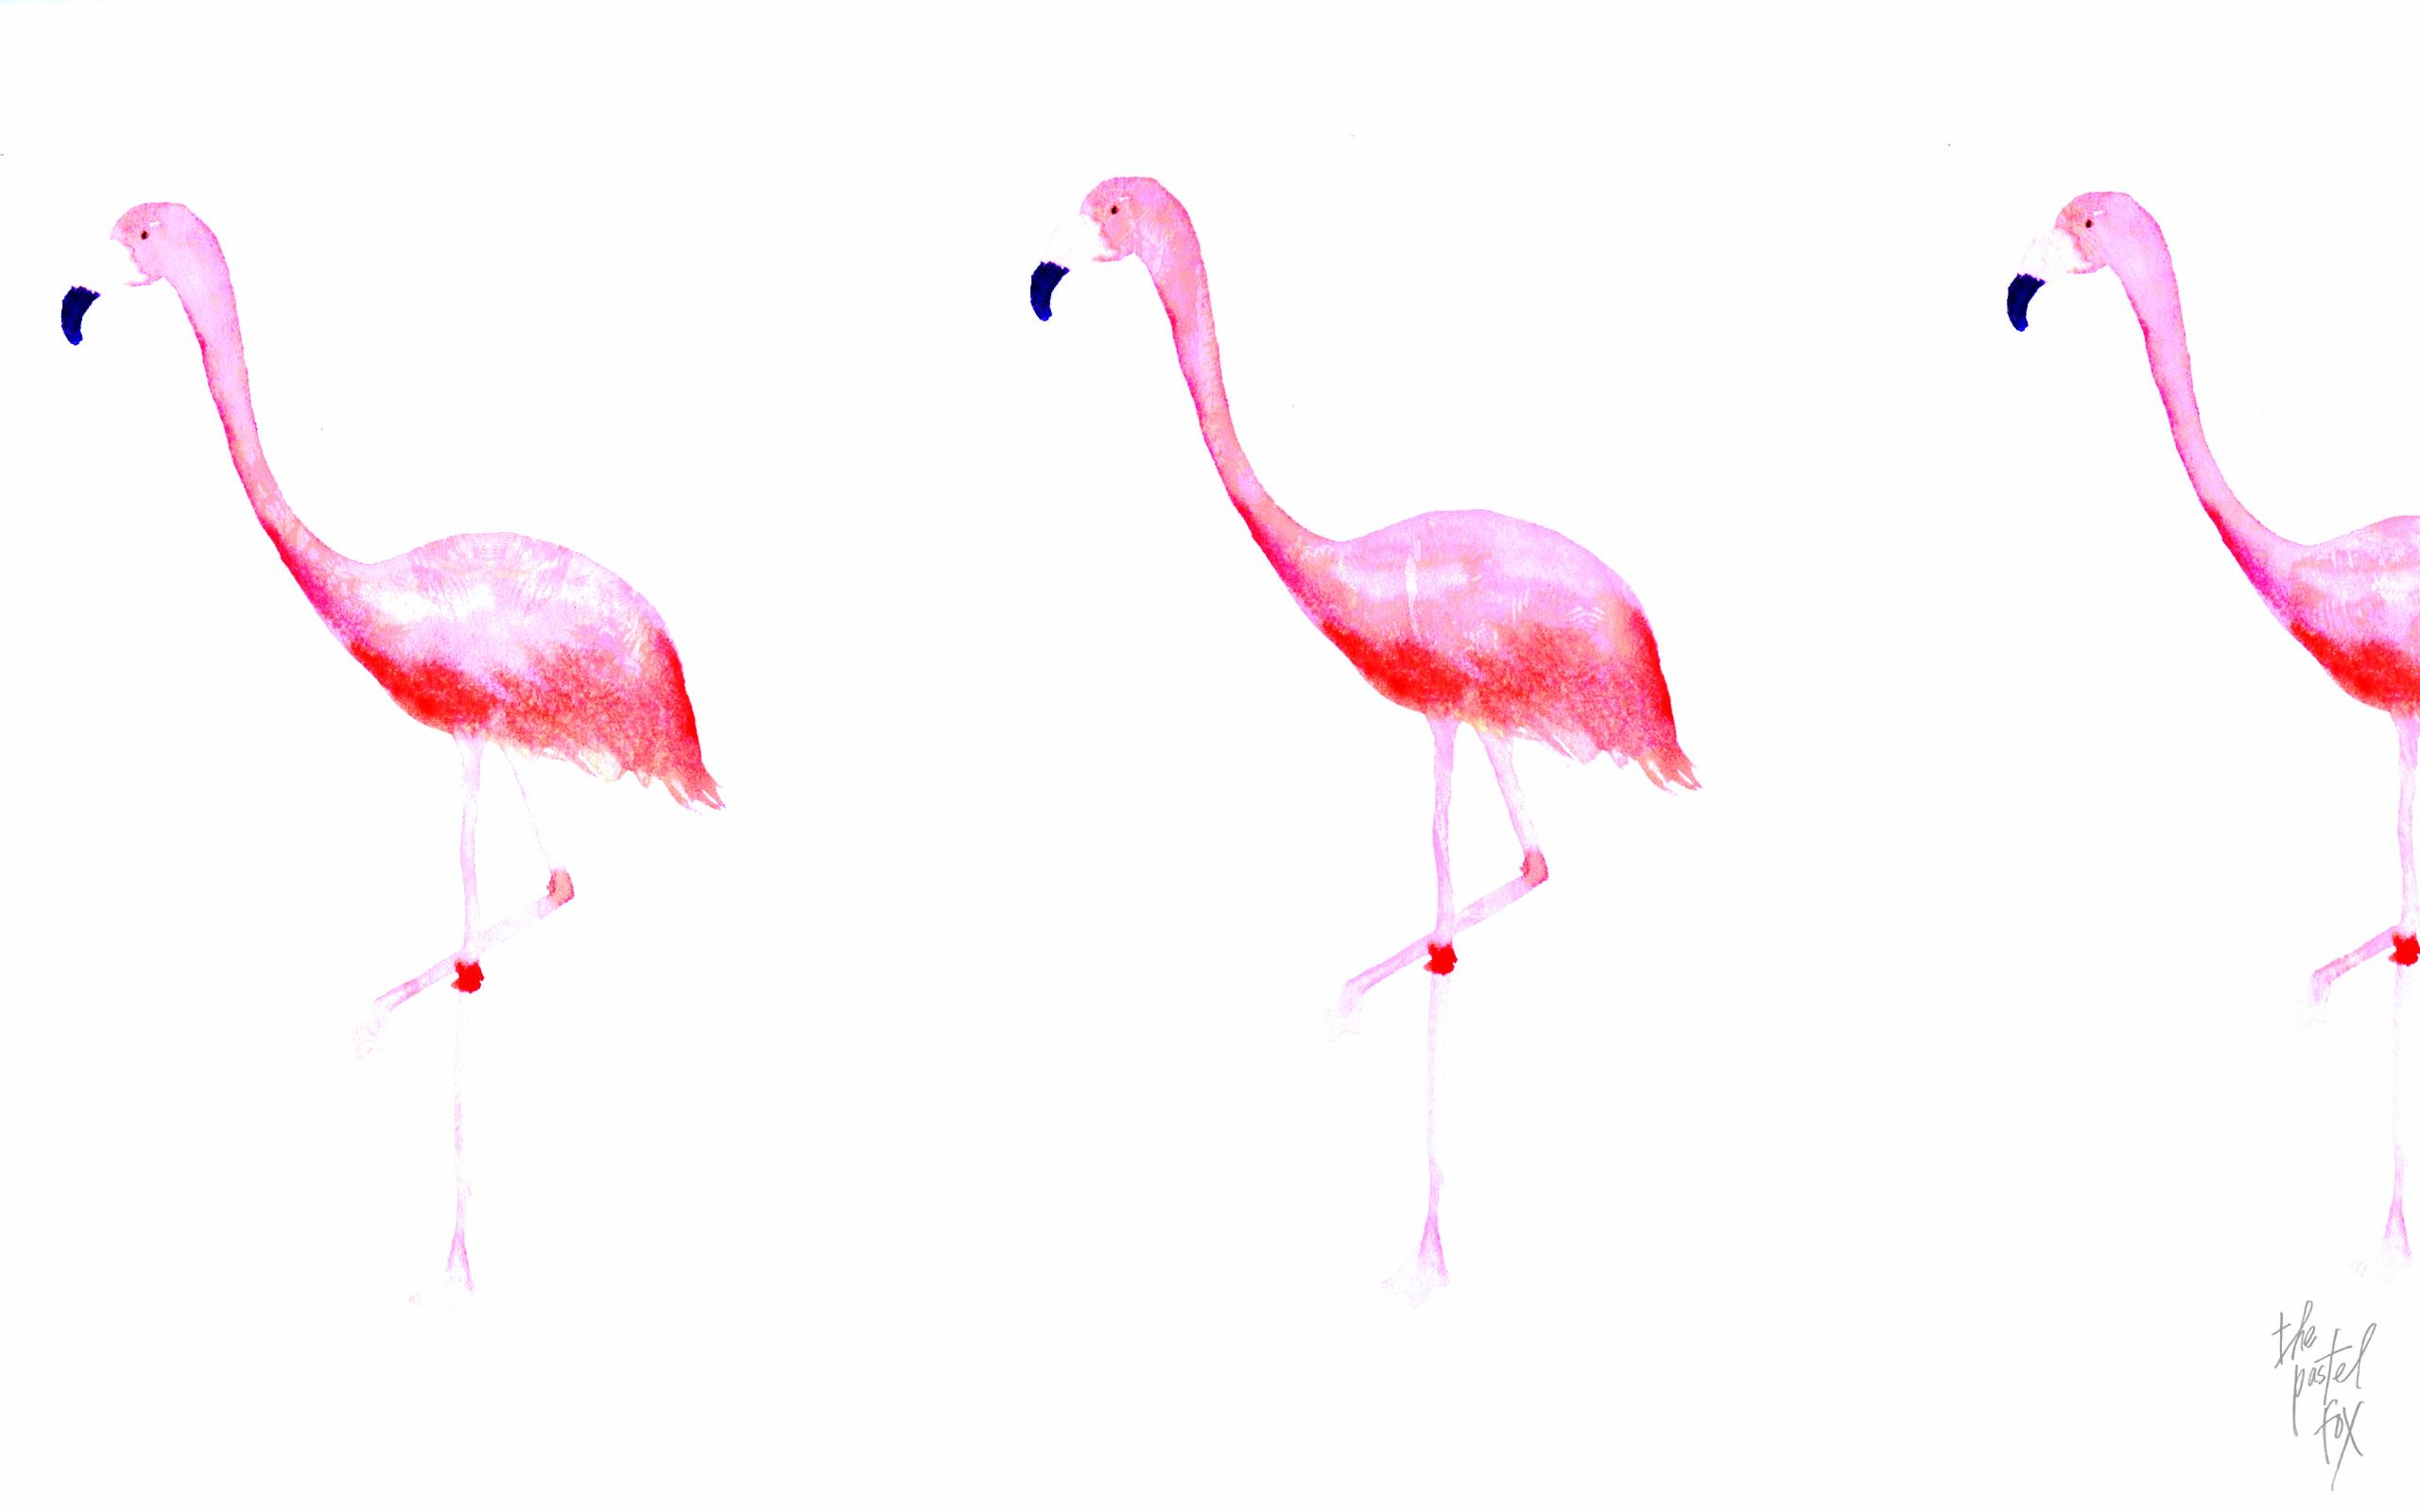 Cute Flamingo Wallpapers Flamingo Wallpapers Hd Pixelstalk Net